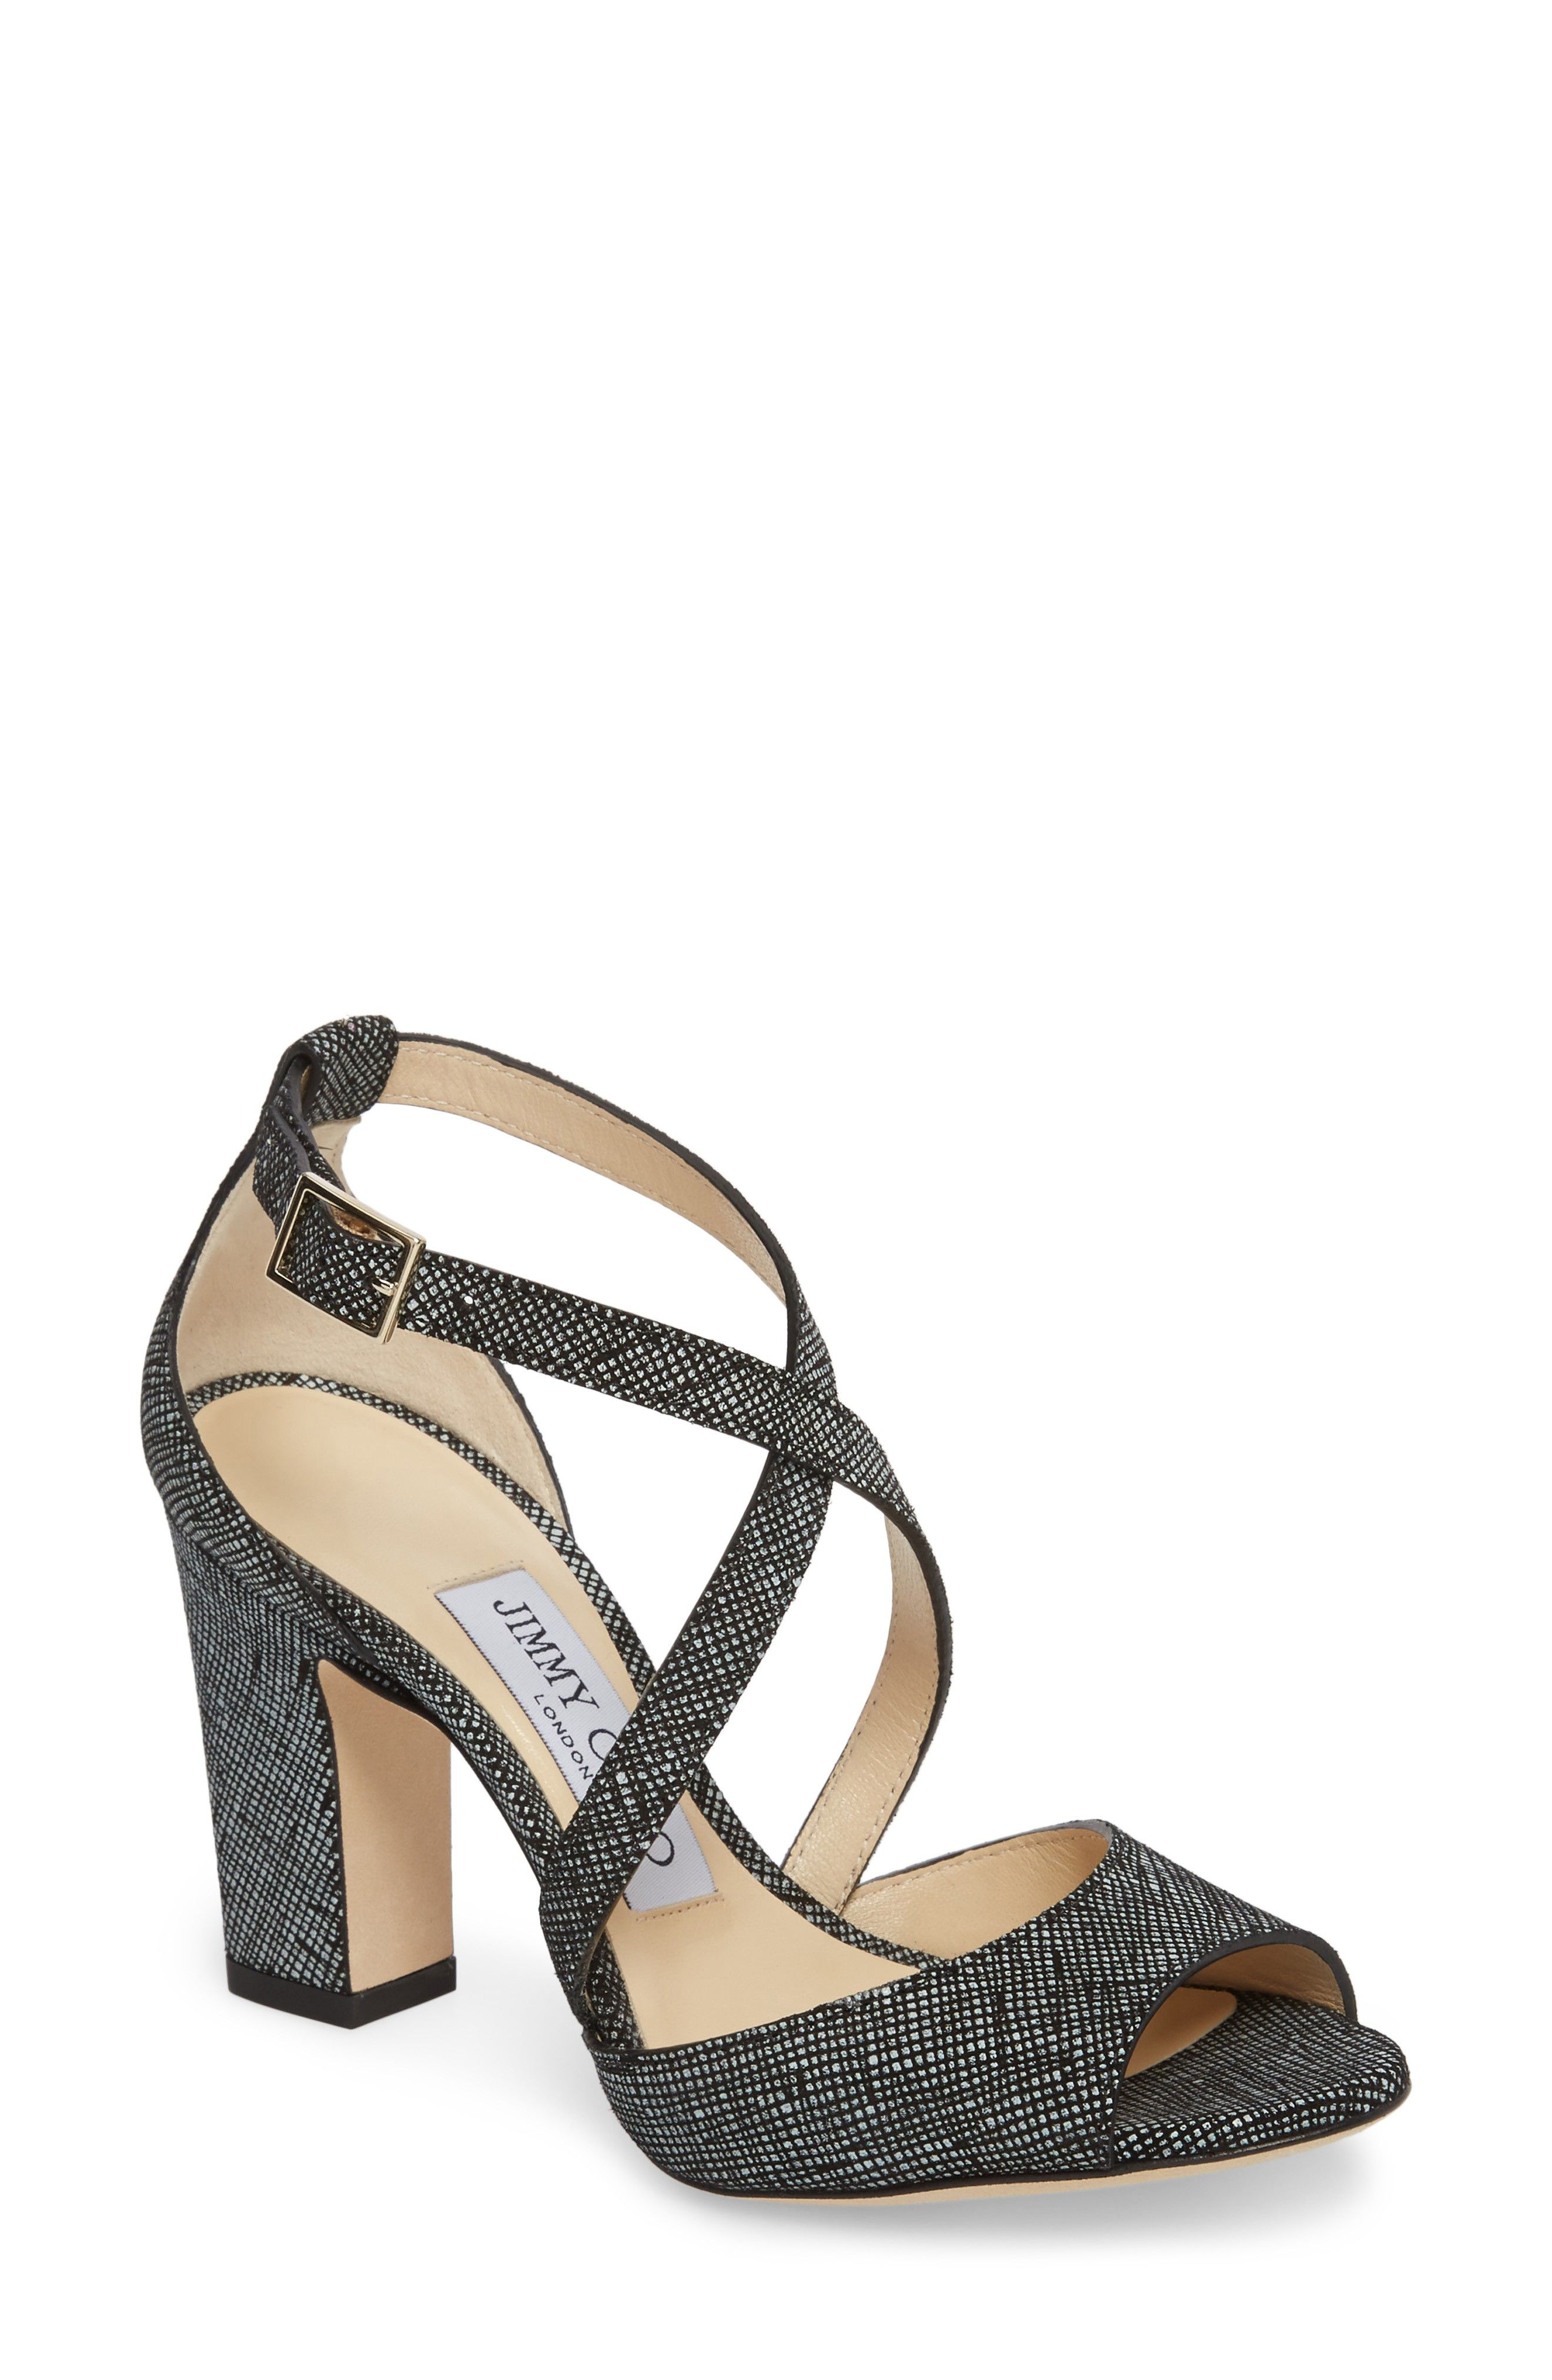 efd19eb80d2 New JIMMY CHOO Carrie Cross Strap Sandal online. New JIMMY CHOO Shoes.    695  SKU ALEF91894CEXC15619